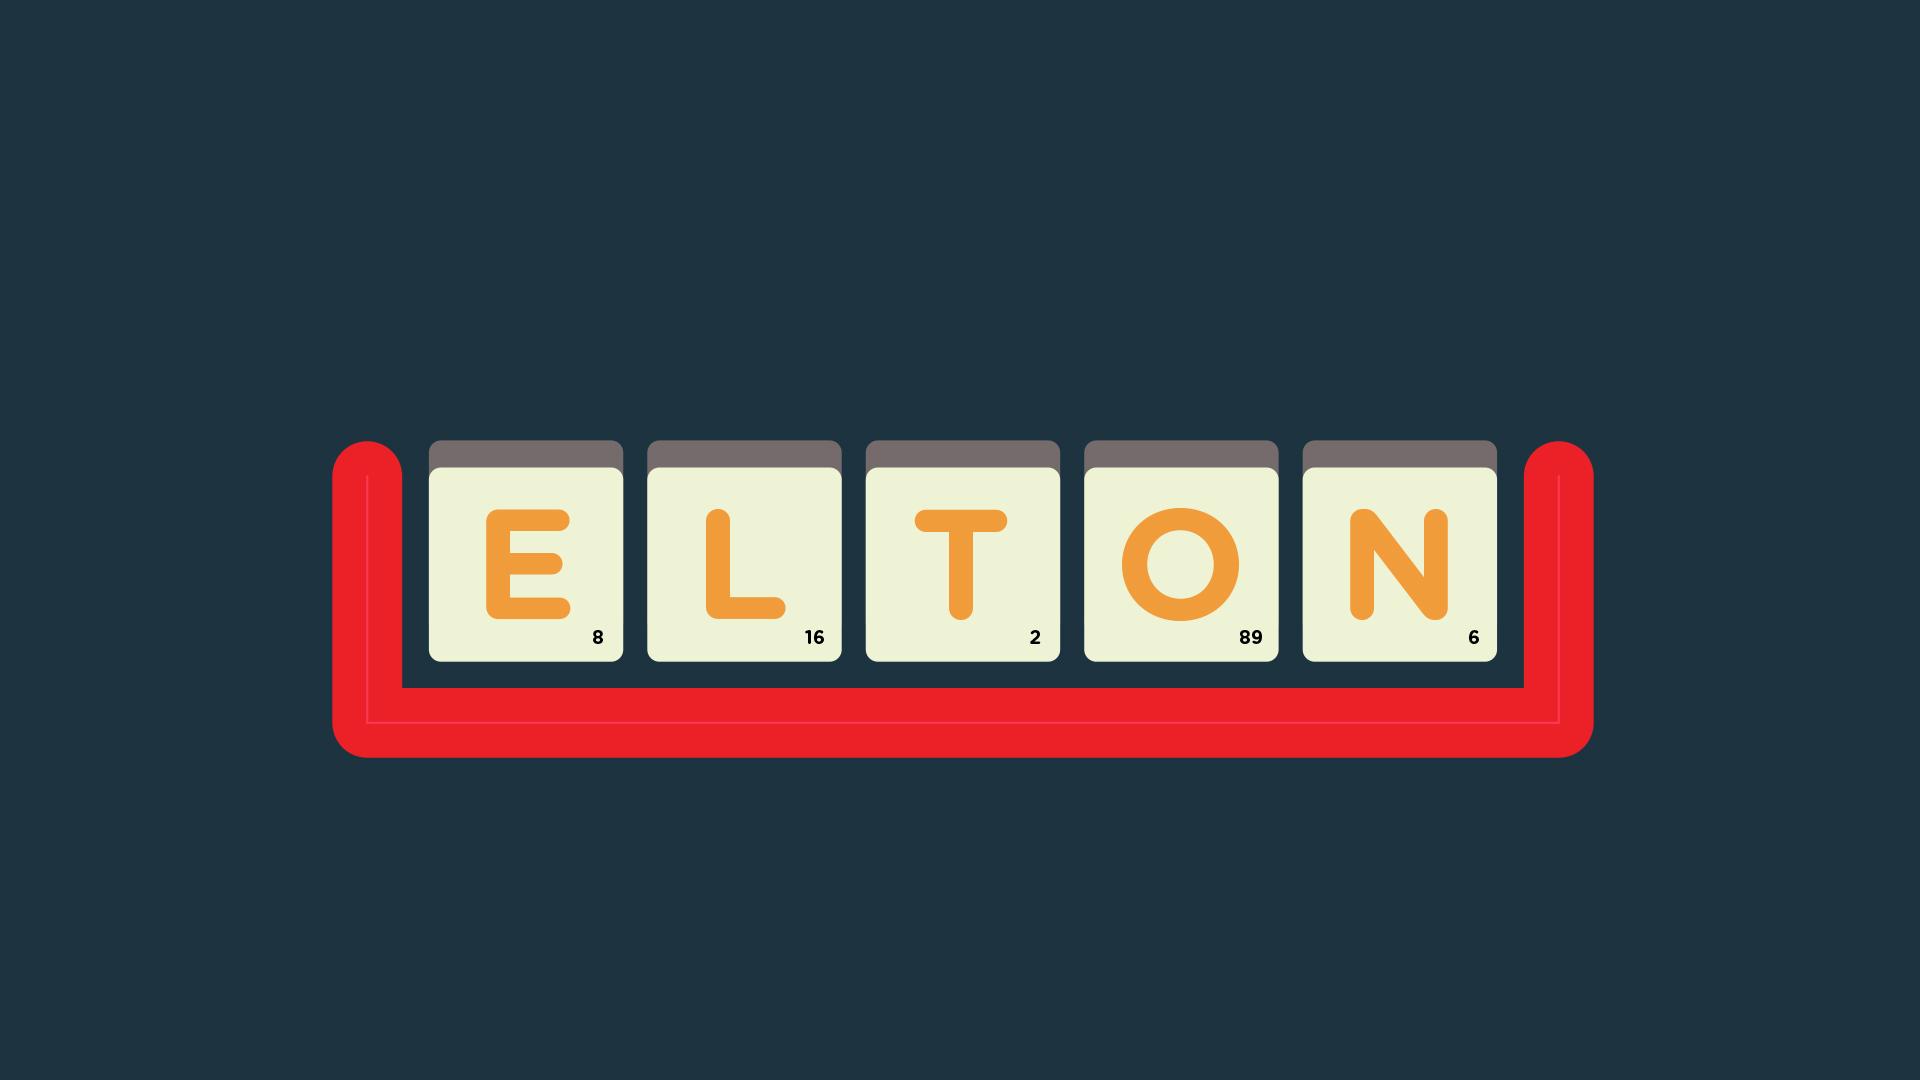 IDKT-about-Elton-John---Young-Illustration-&-Animation-Studio-Manchester-2D,-MOTION-GRAPHICS,-INFOGRAPHICS,elton,-piano,-scrabble.jpg